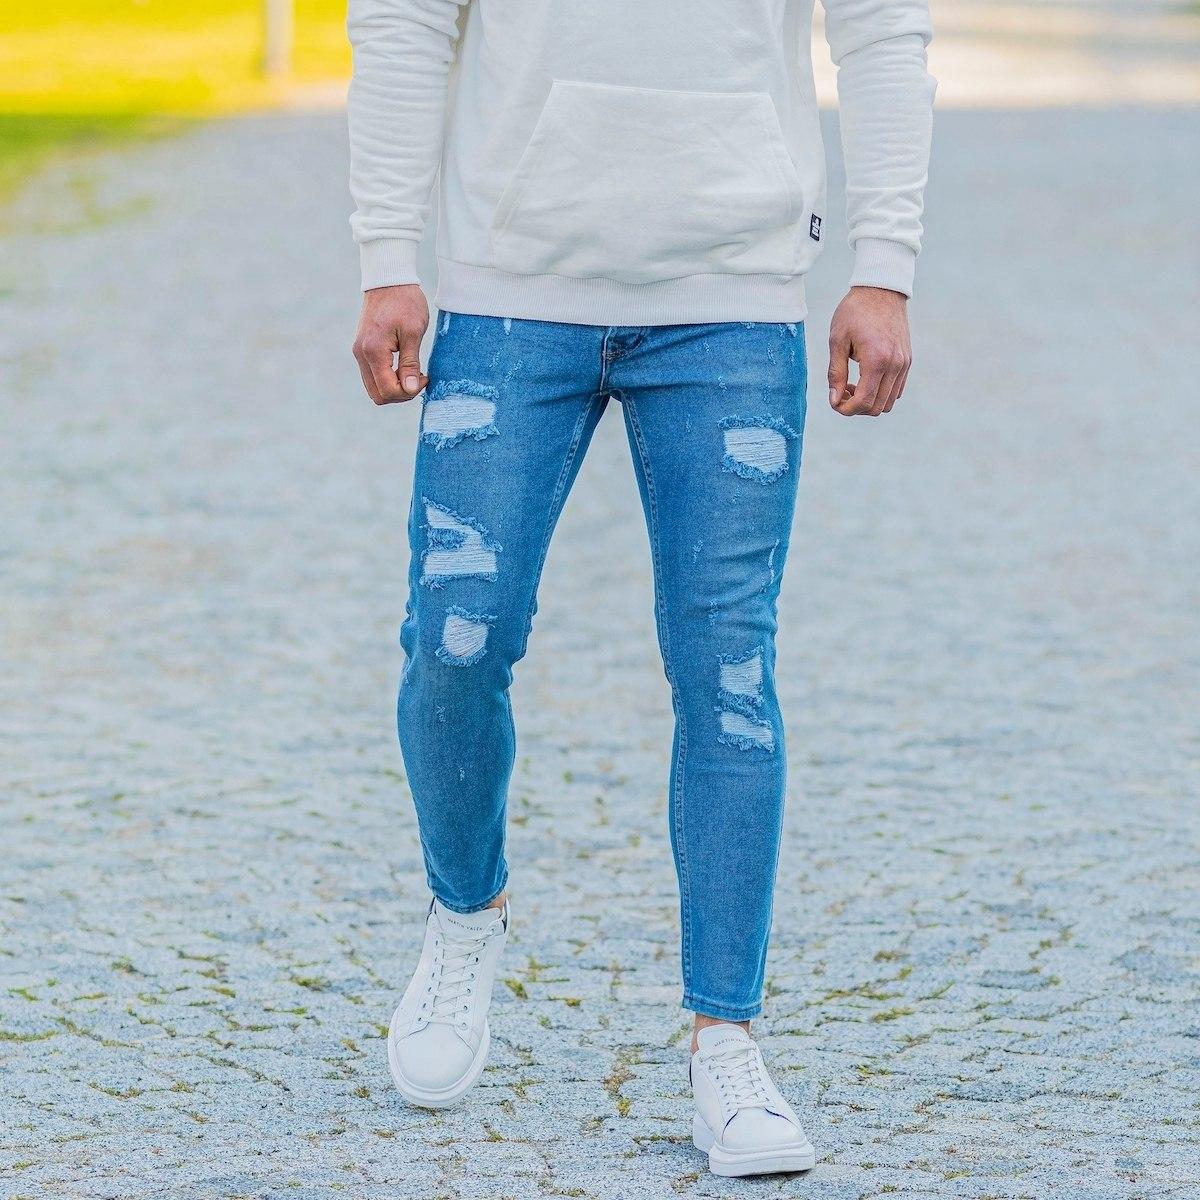 Men's Skinny Ragged Jeans...